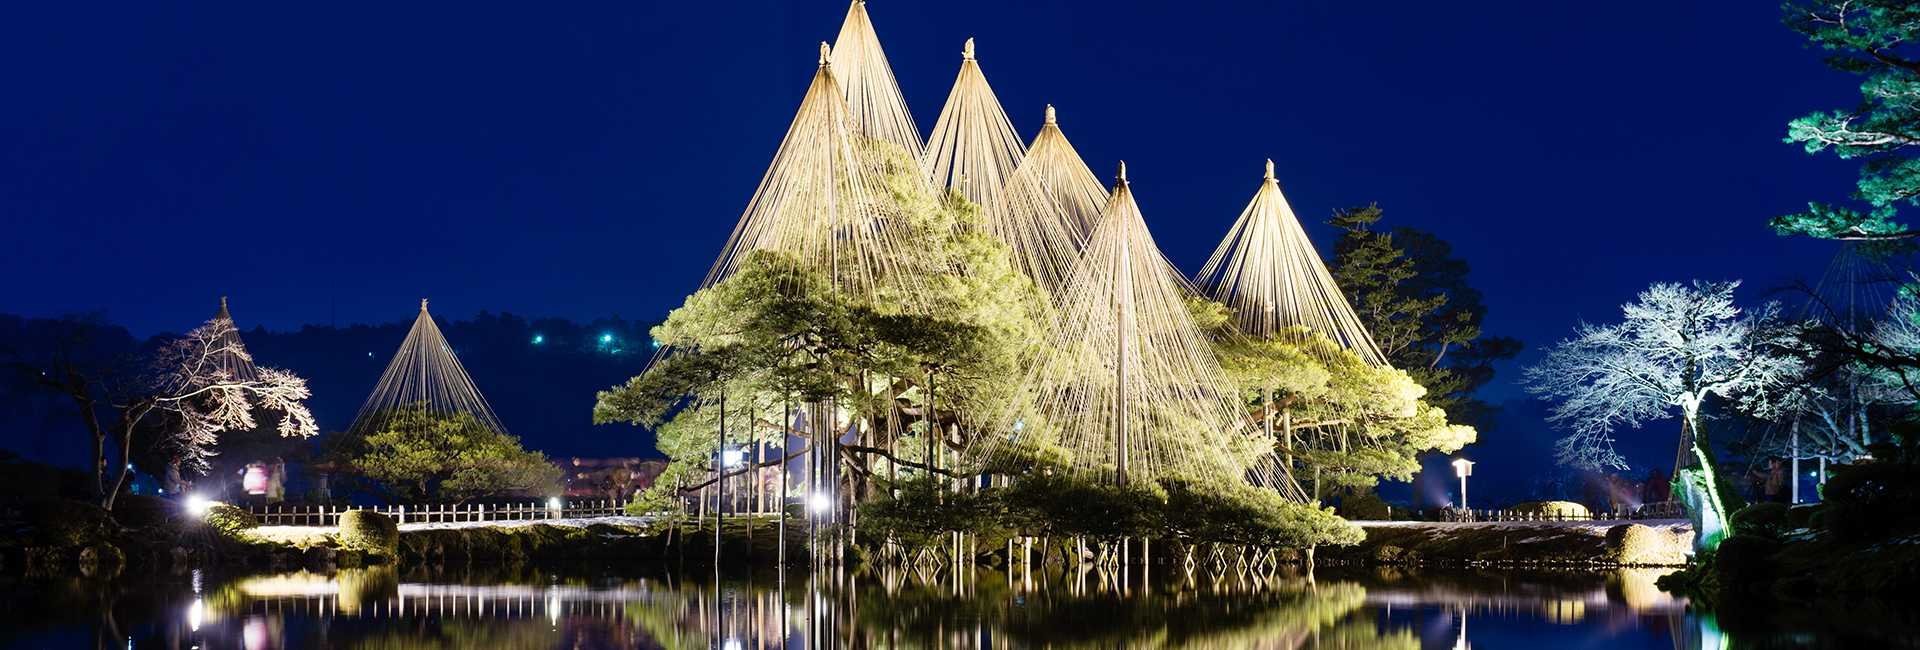 giardino kenrokuen a Kanazawa